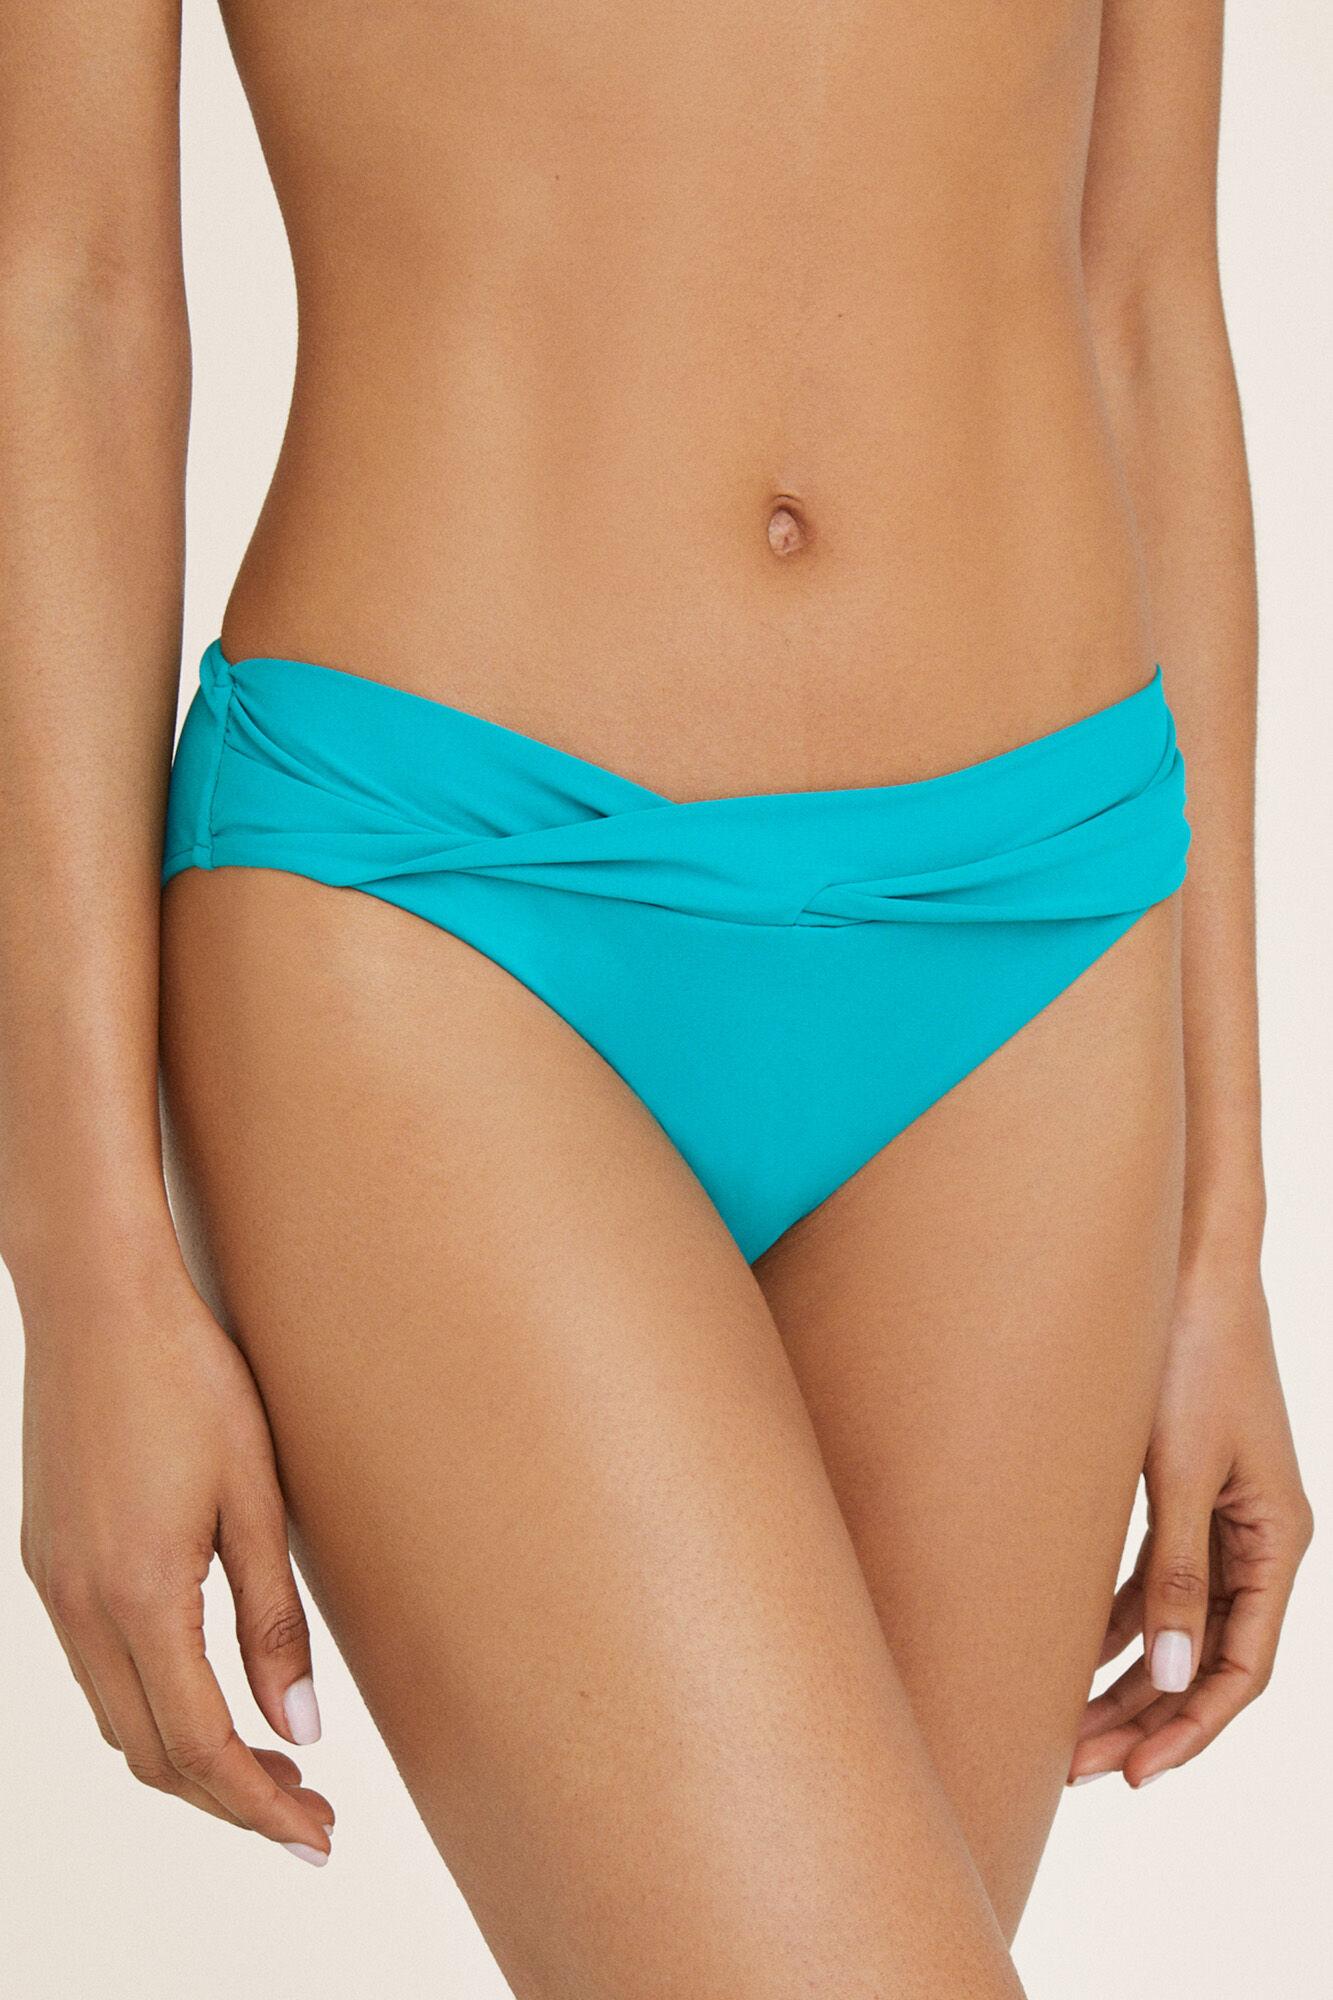 34f87702182b Braga bikini alta drapeada